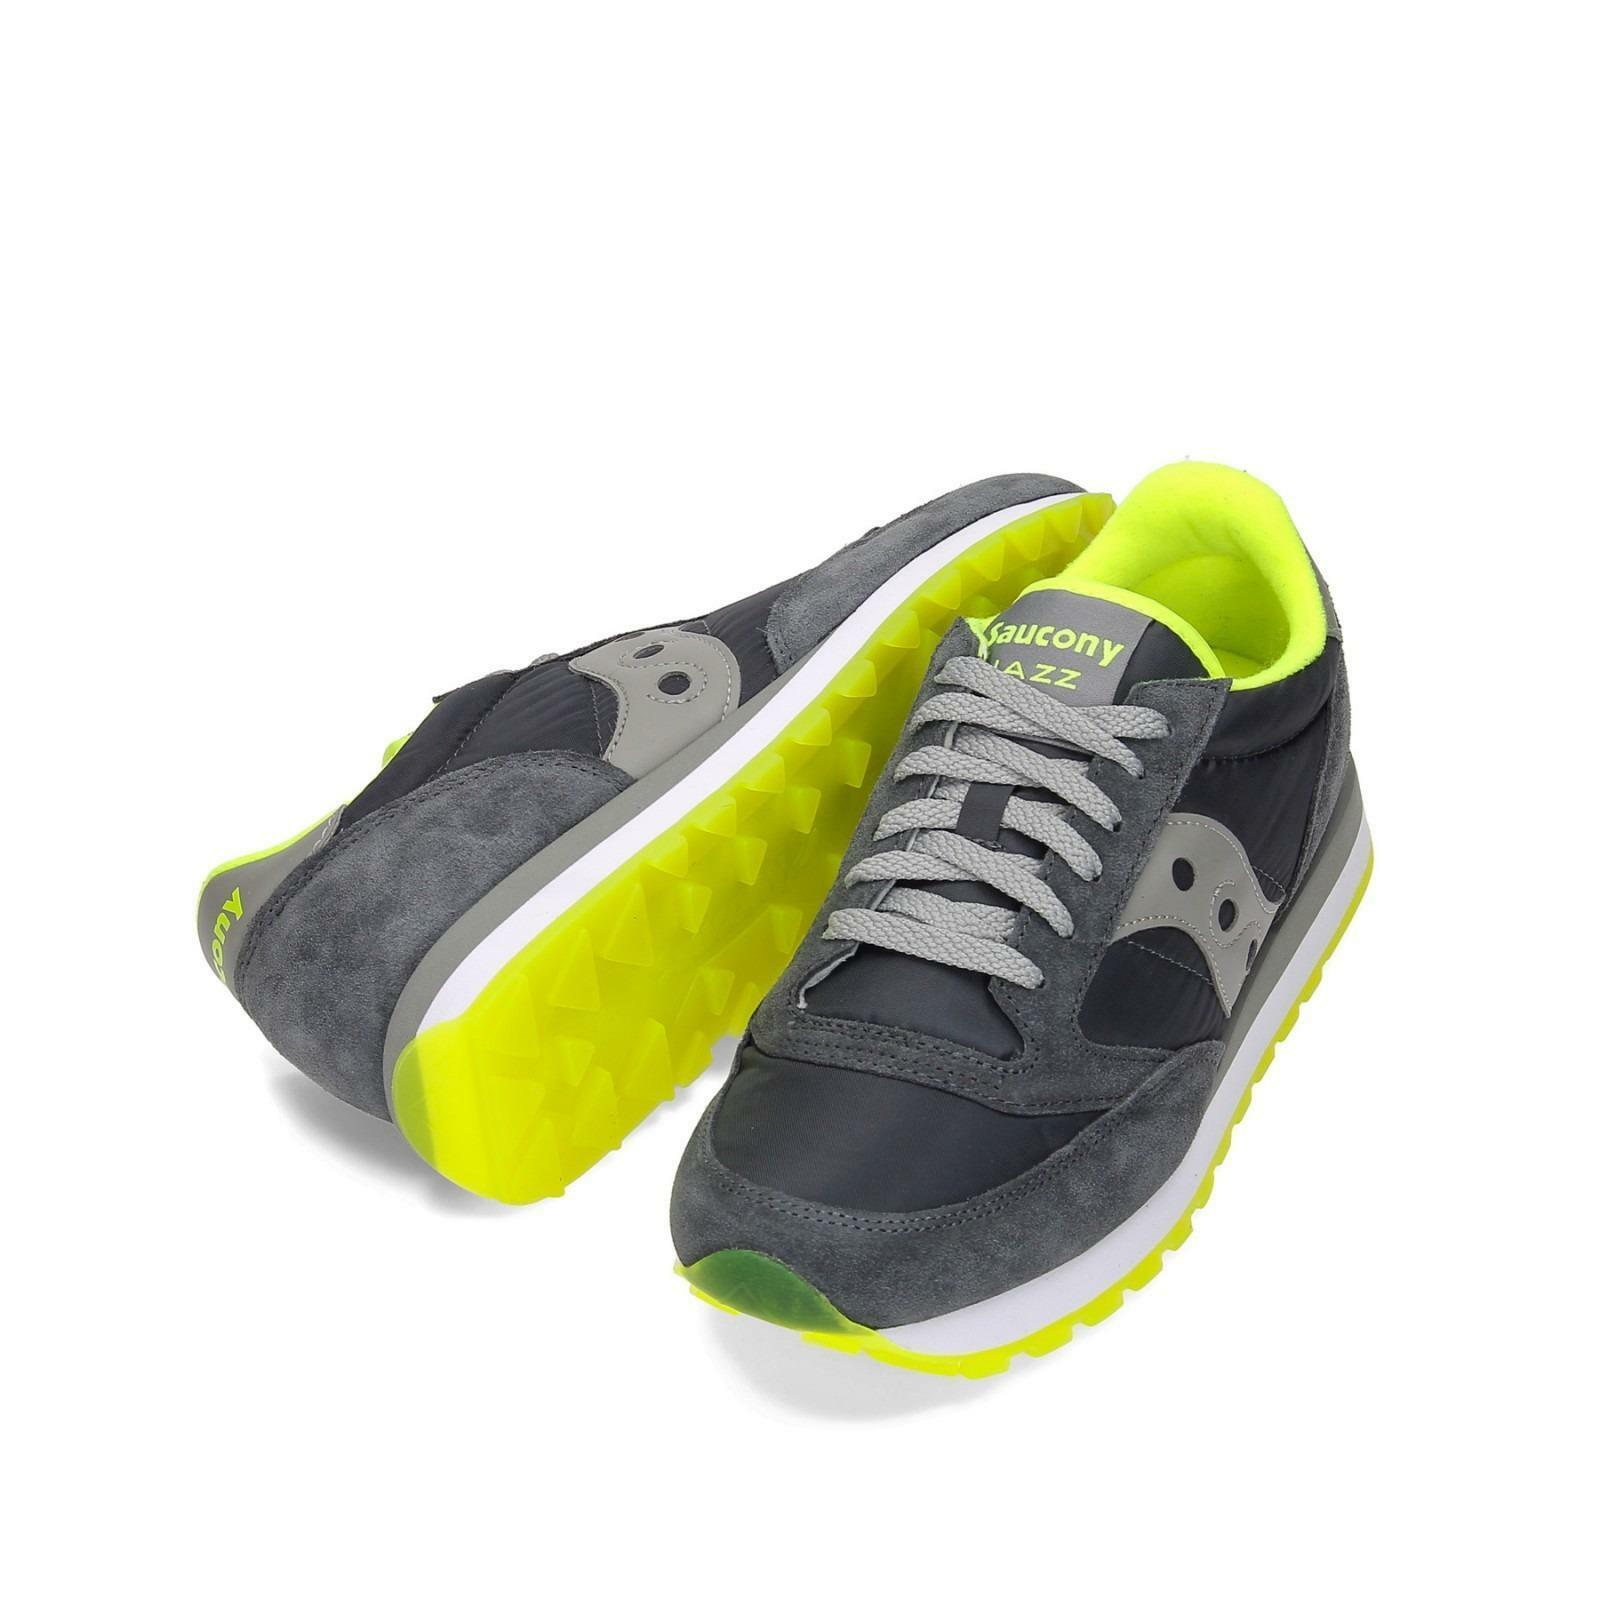 saucony saucony scarpa jazz original uomo grigio giallo fluo 2044-257